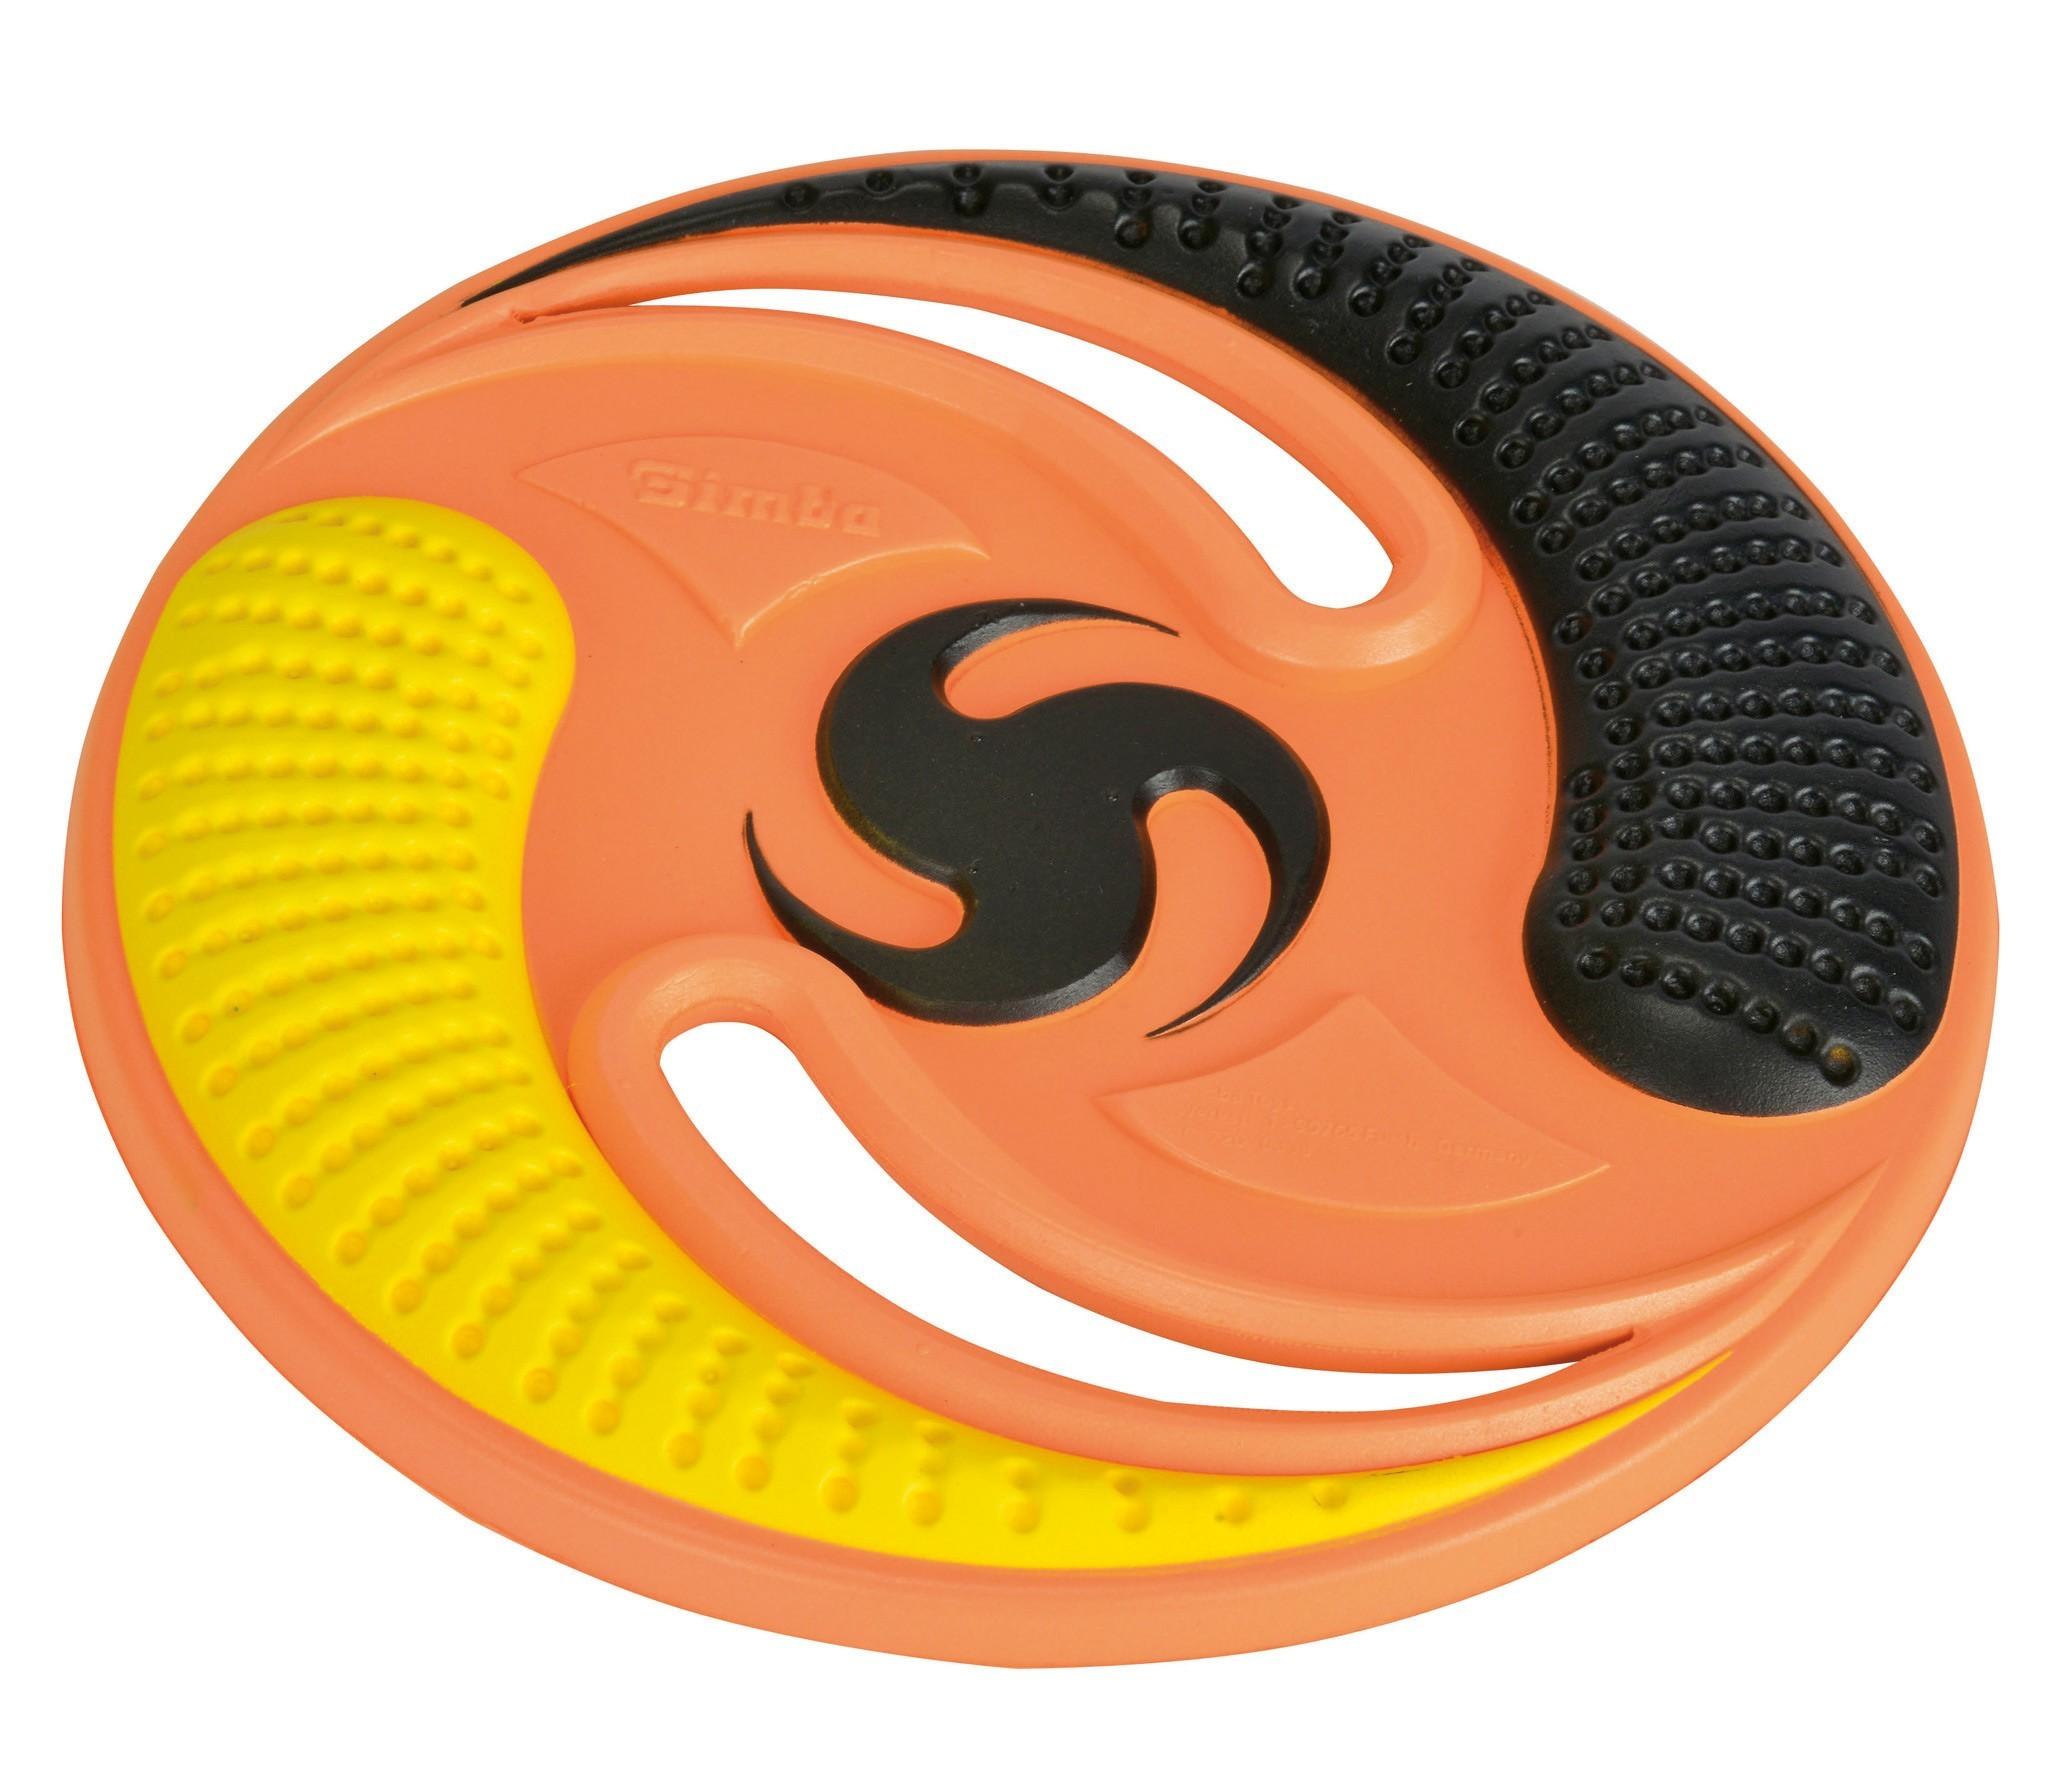 Frisbeescheibe Cyberdisc Soft Simba Bild 3